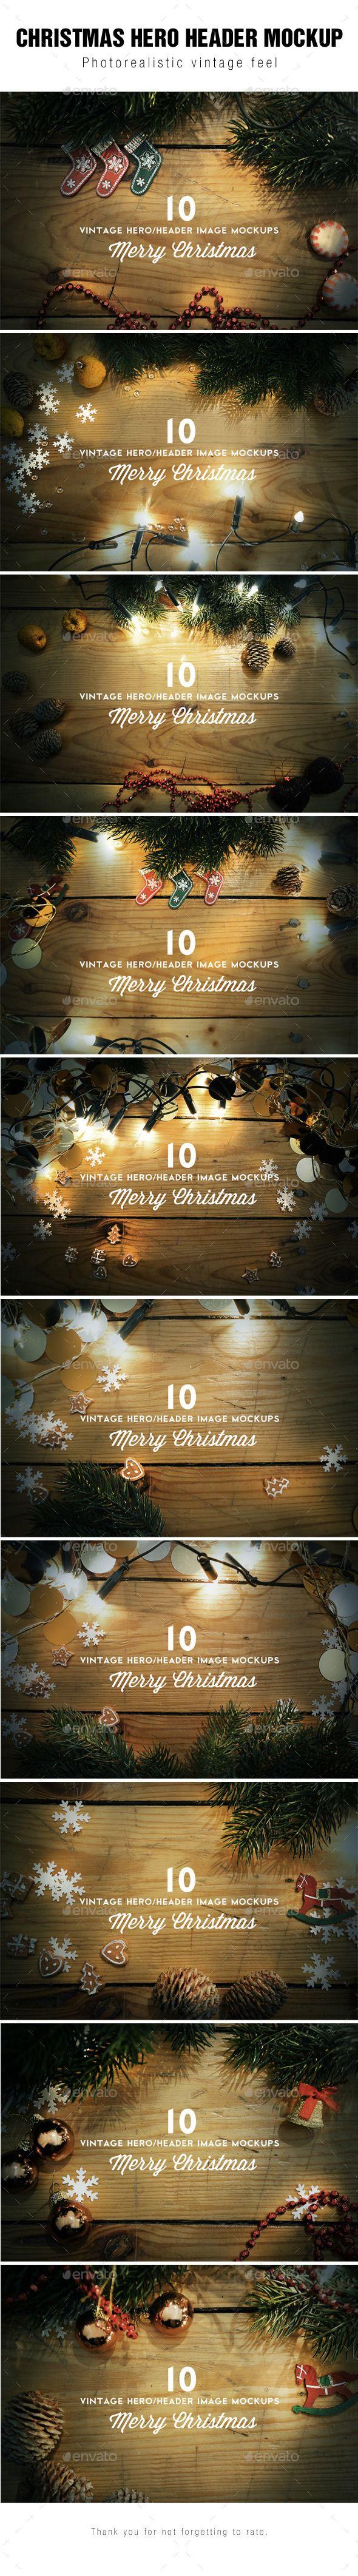 Christmas Hero / Header Images Mockup #design Download: http://graphicriver.net/item/christmas-hero-header-images-mockup/9409467?ref=ksioks